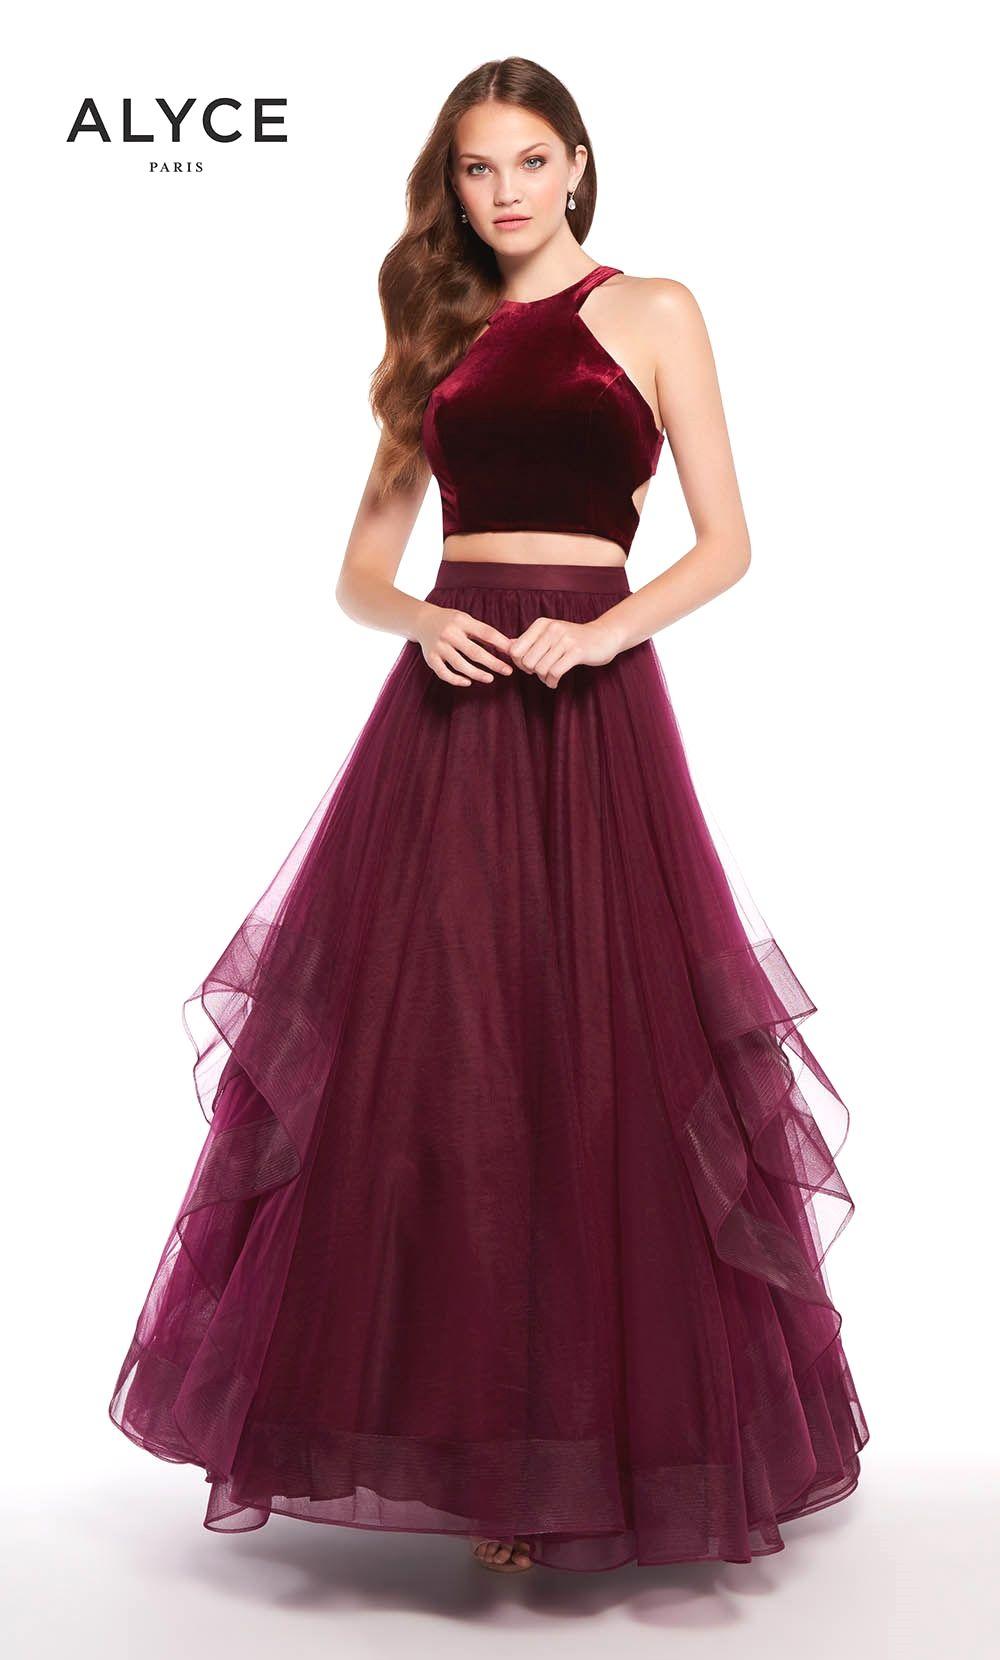 Alyce burgundy two piece prom dress designer prom dresses